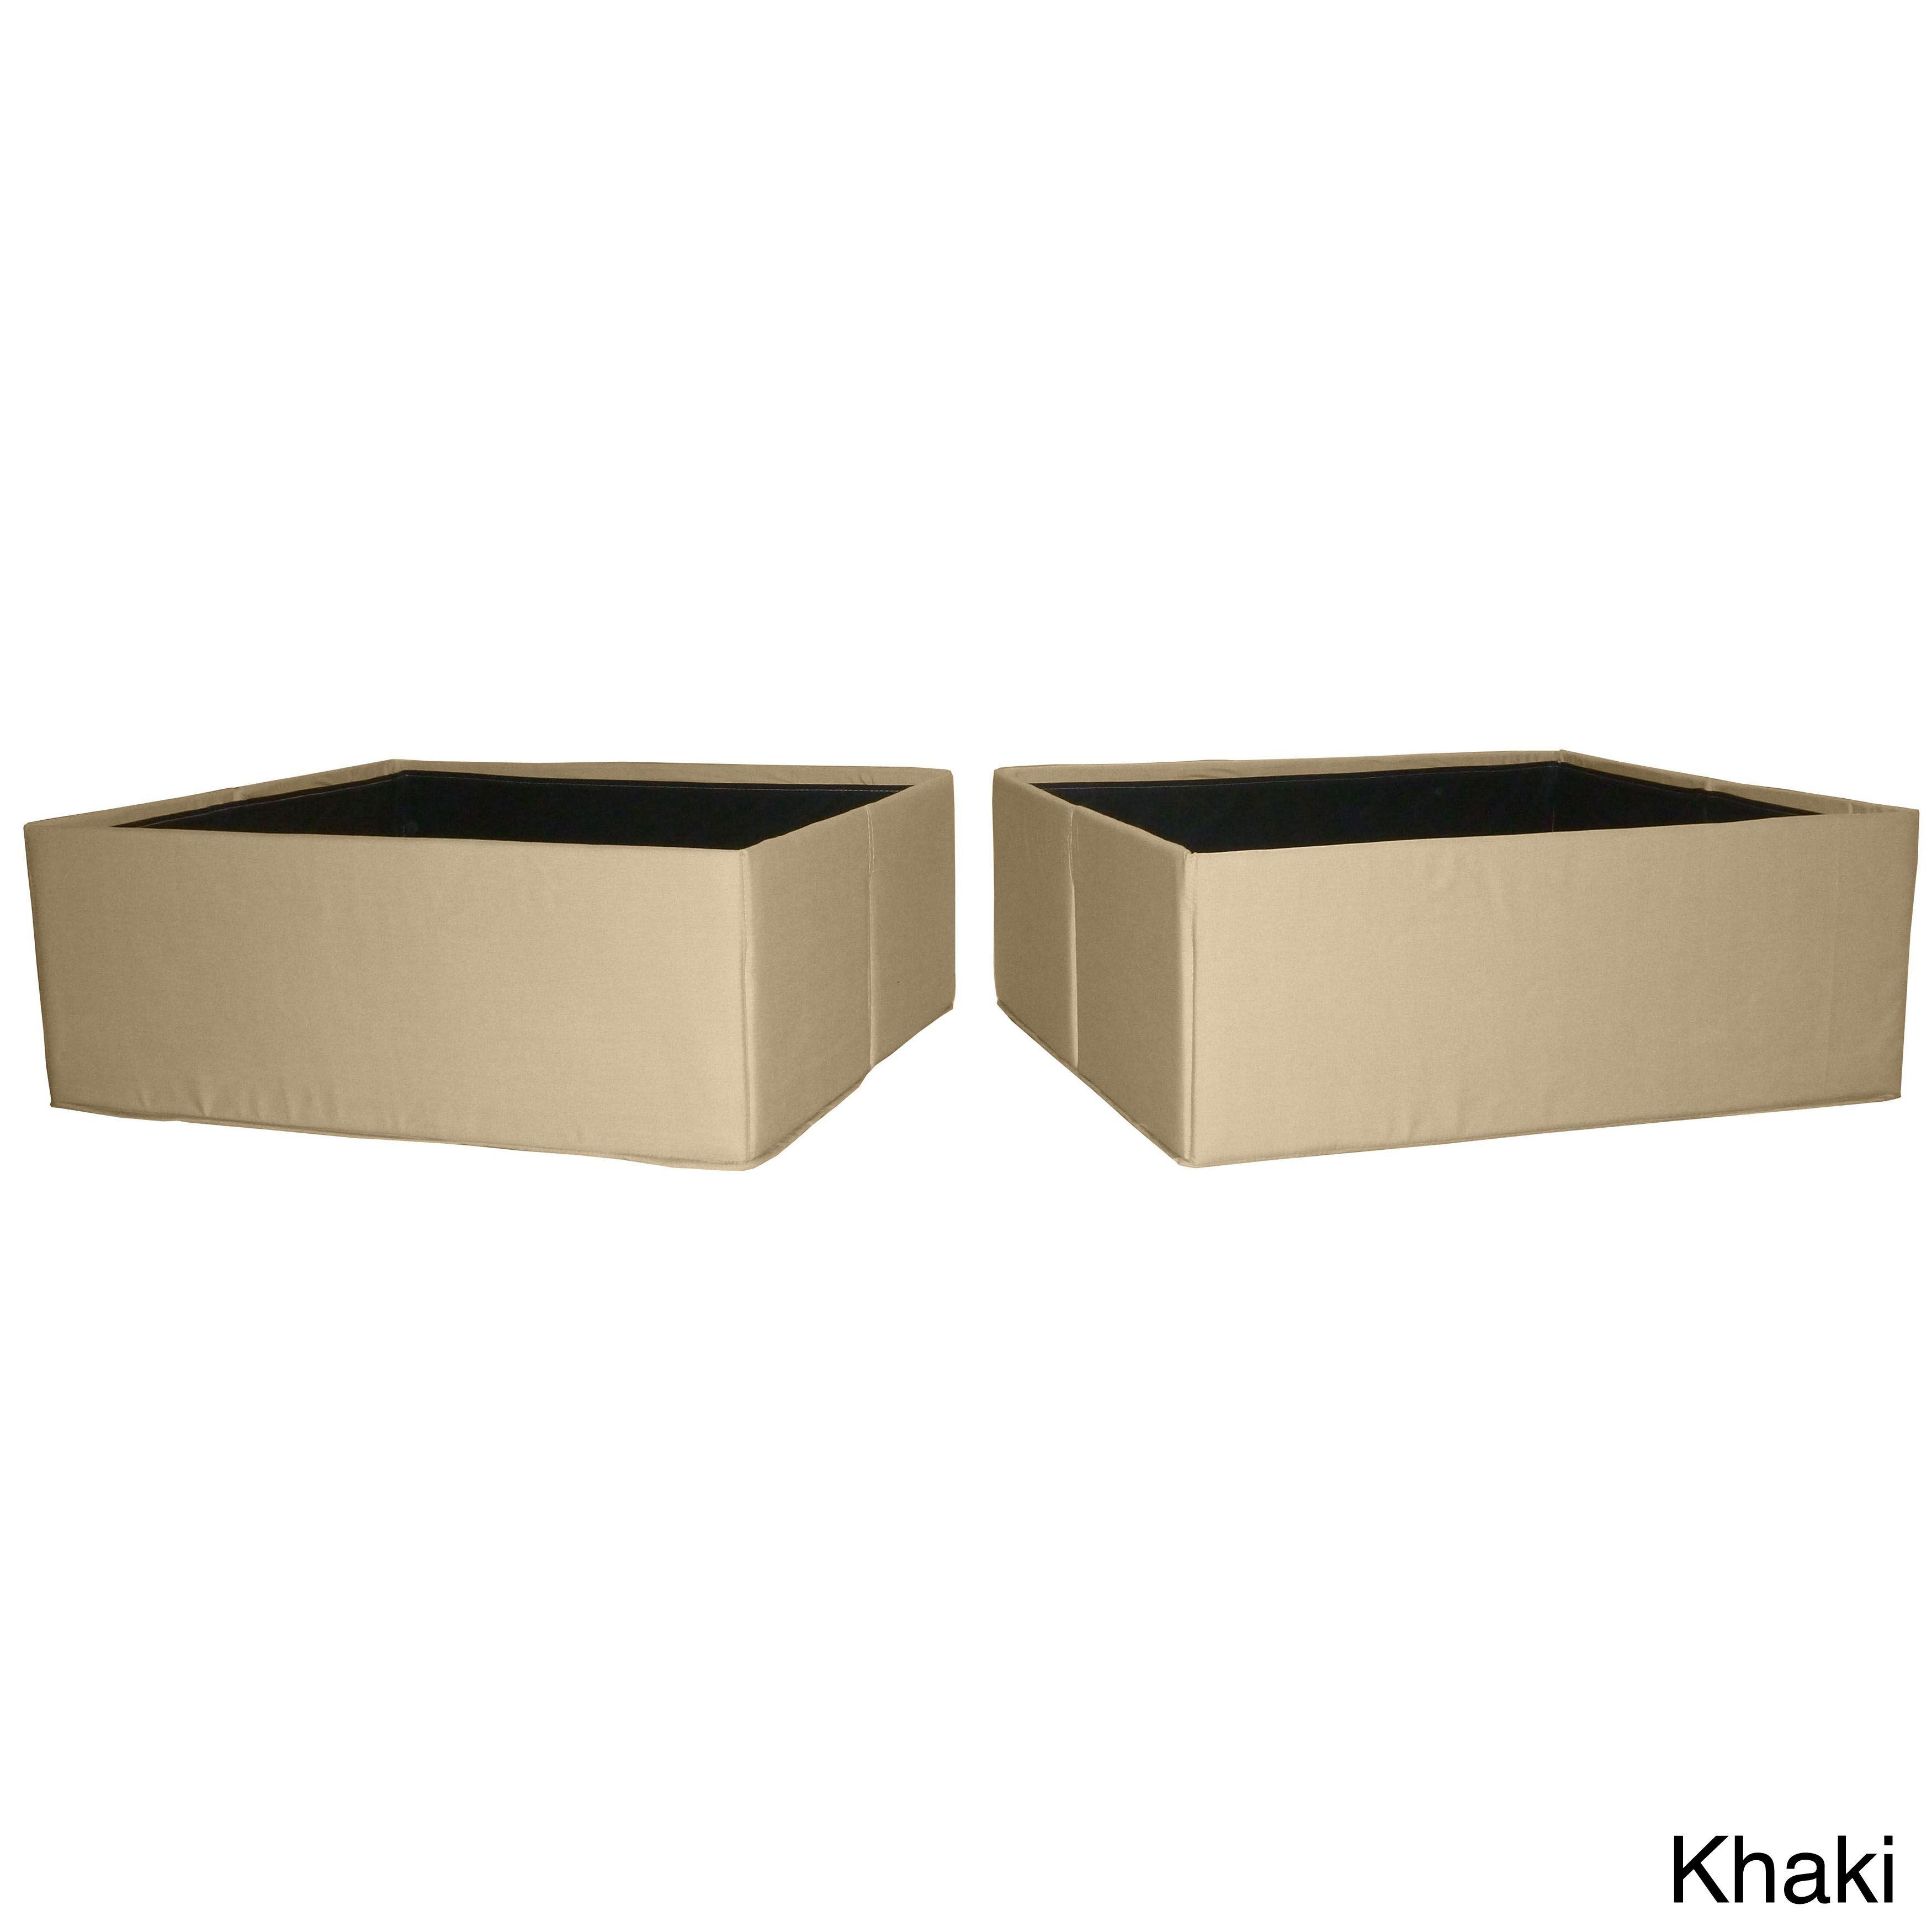 Online Shopping - Bedding Furniture Electronics Jewelry Clothing & Storage Bins